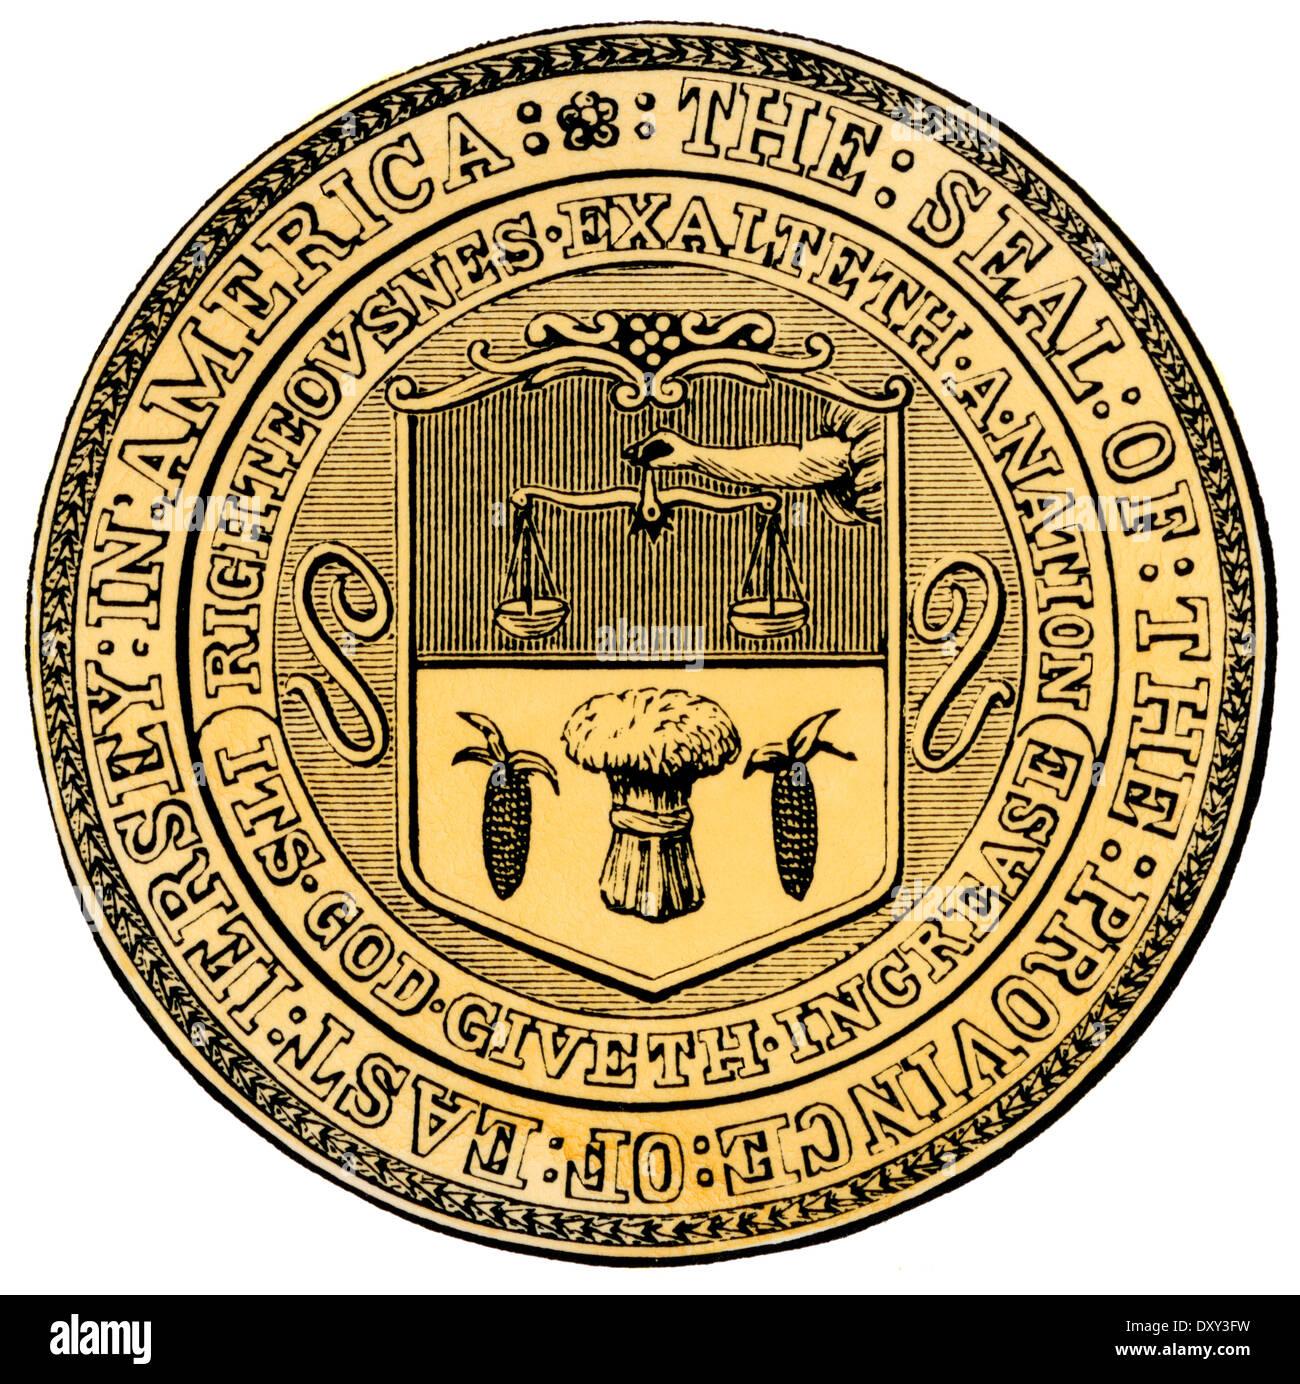 Koloniale Siegel der Provinz Ost Jersey. Handkolorierten Holzschnitt Stockbild